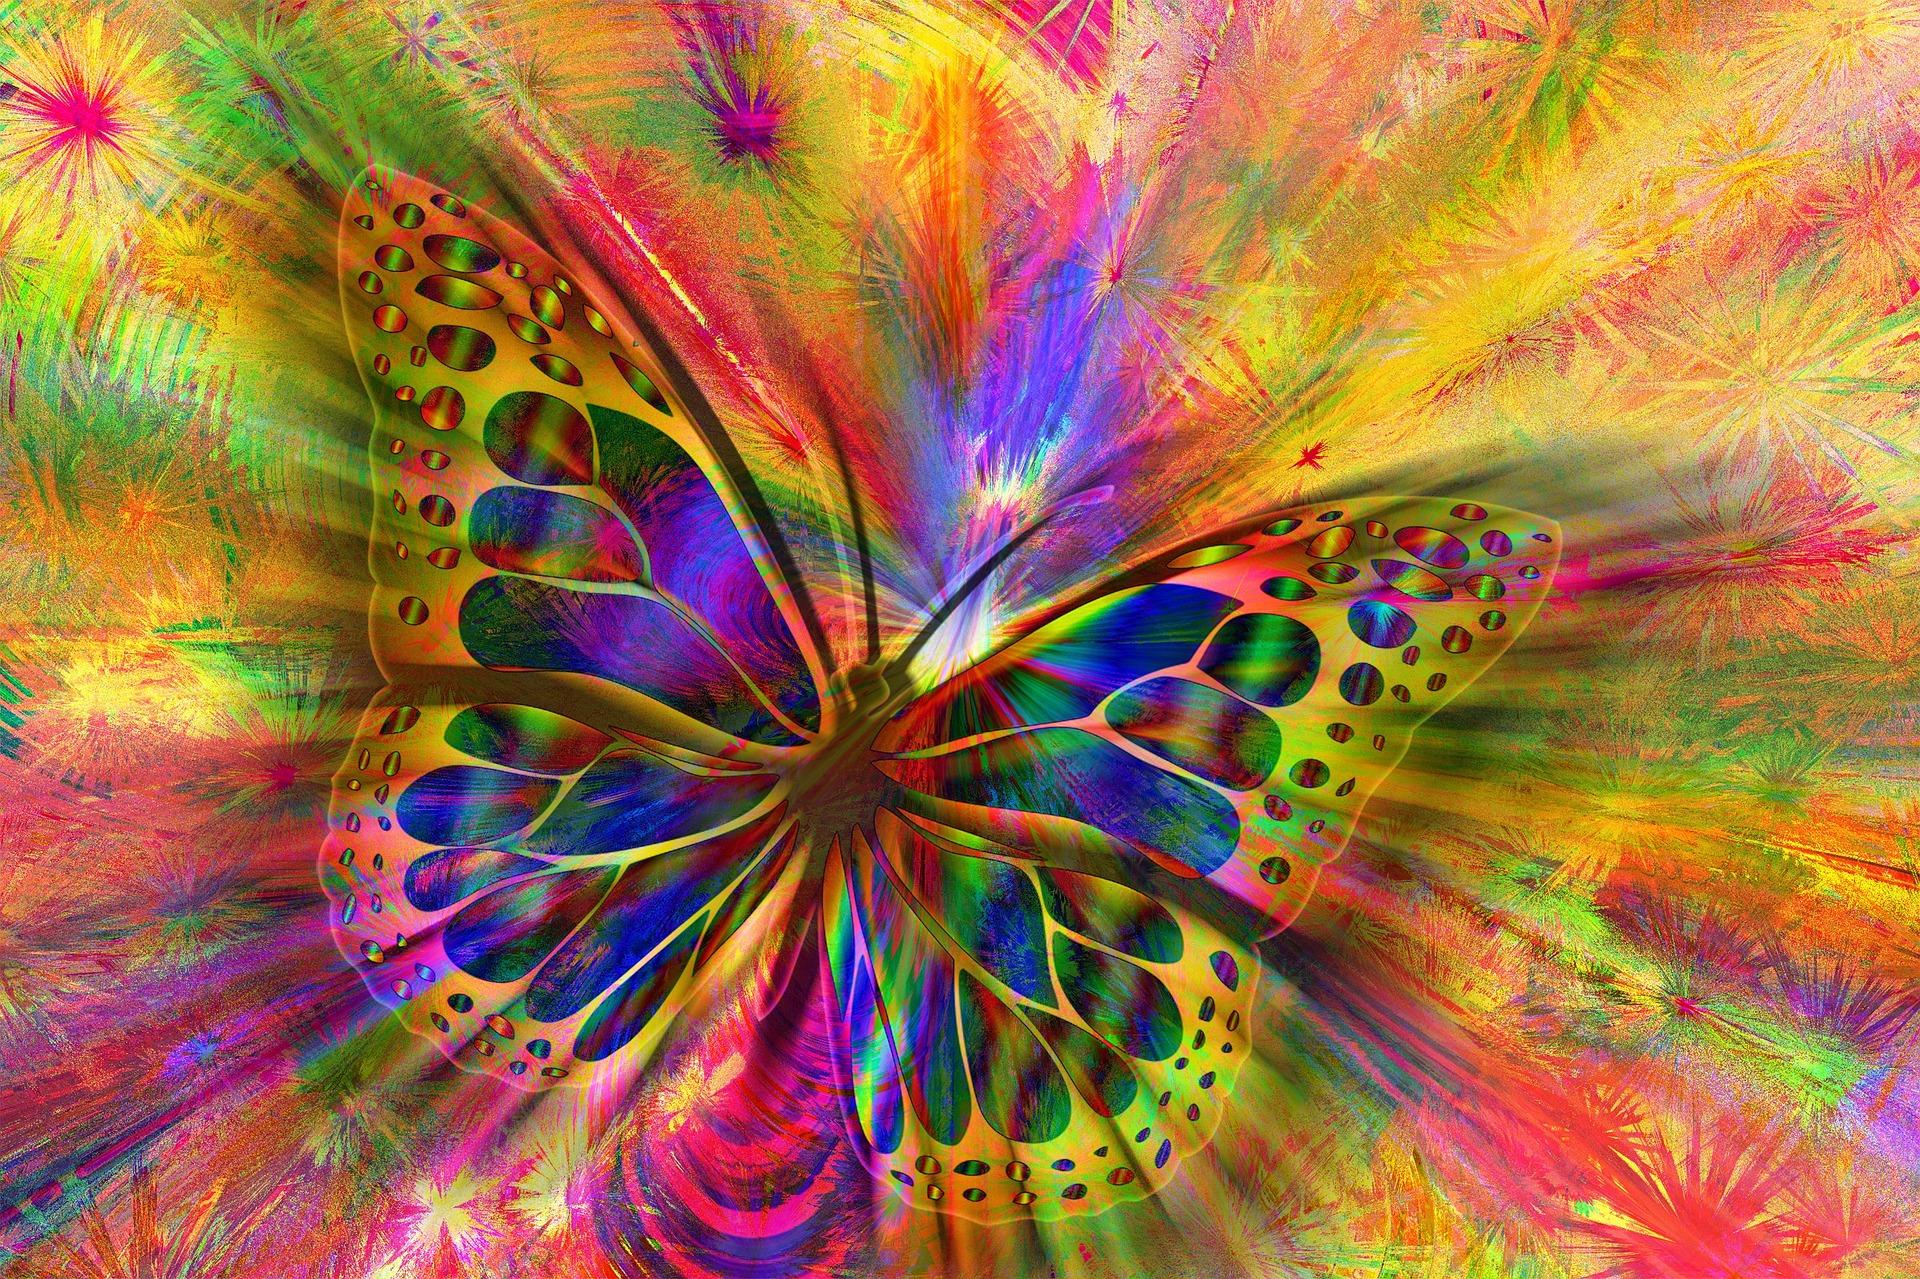 vibratii joase - sfatulparintilor.ro - pixabay_com - arrangement-2794696_1920